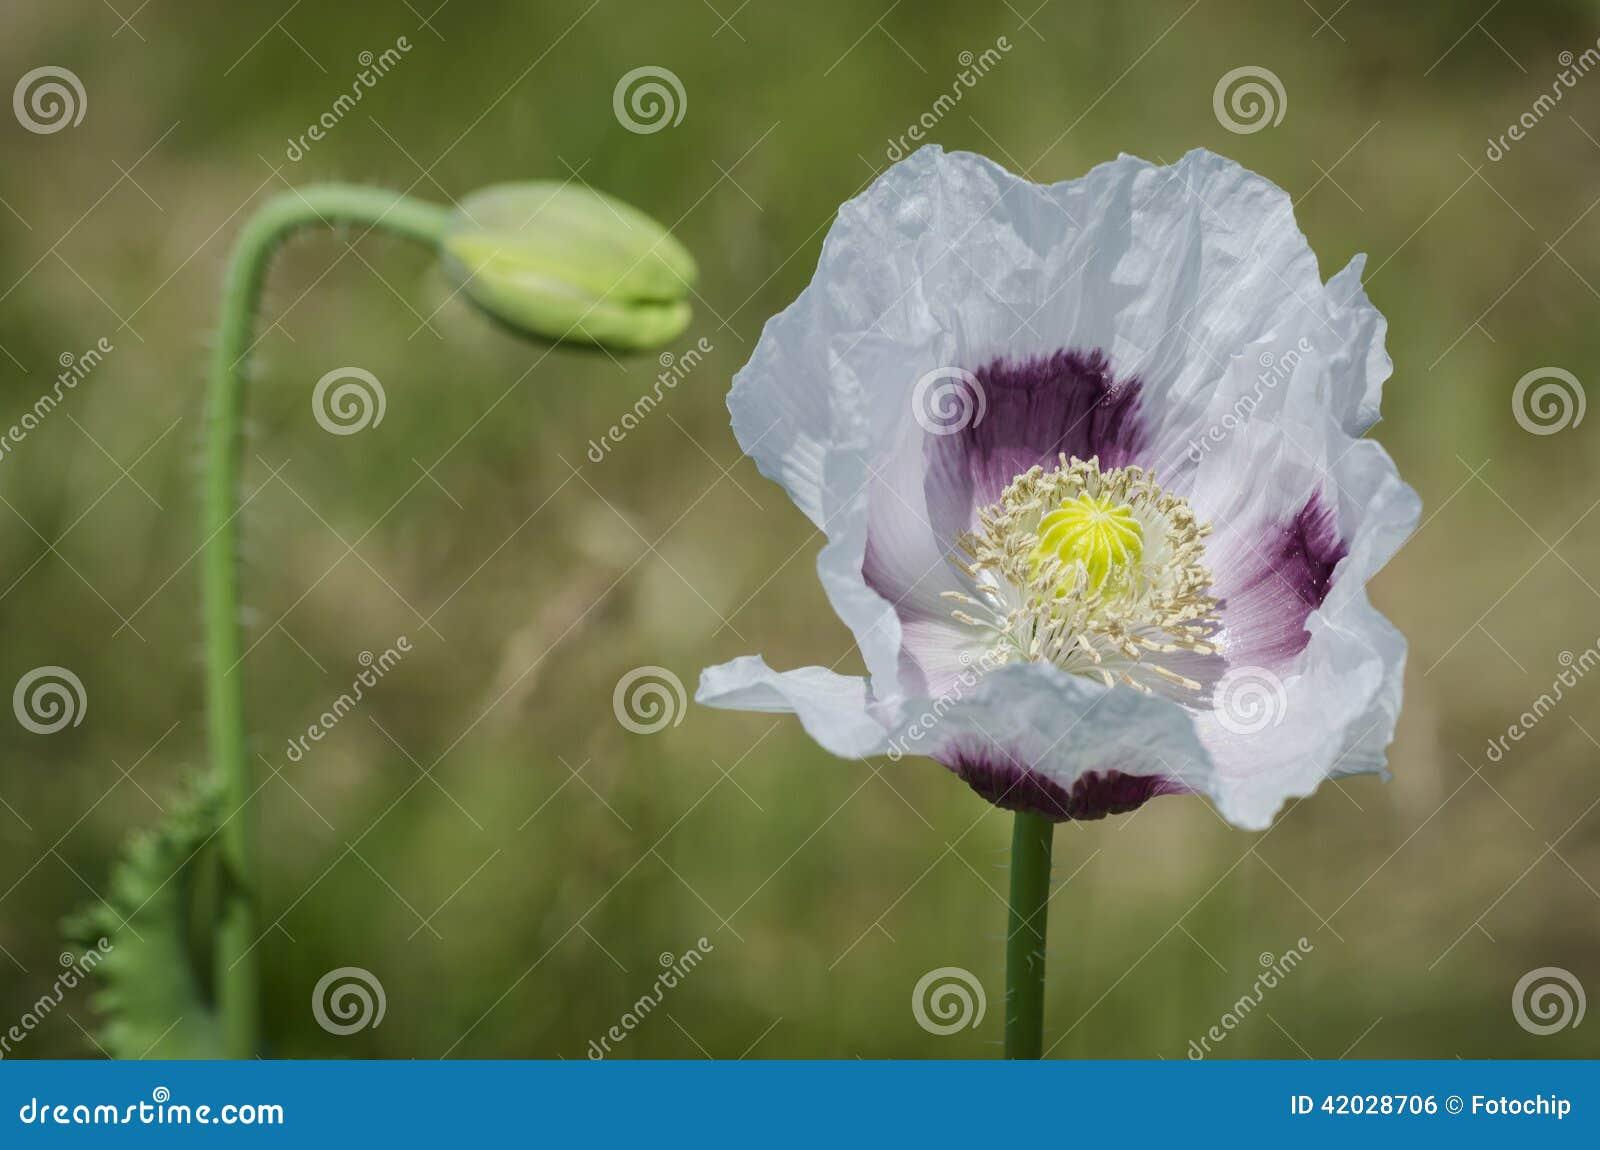 Flowering Opium Poppy Papaver Somniferum Stock Photo Image Of